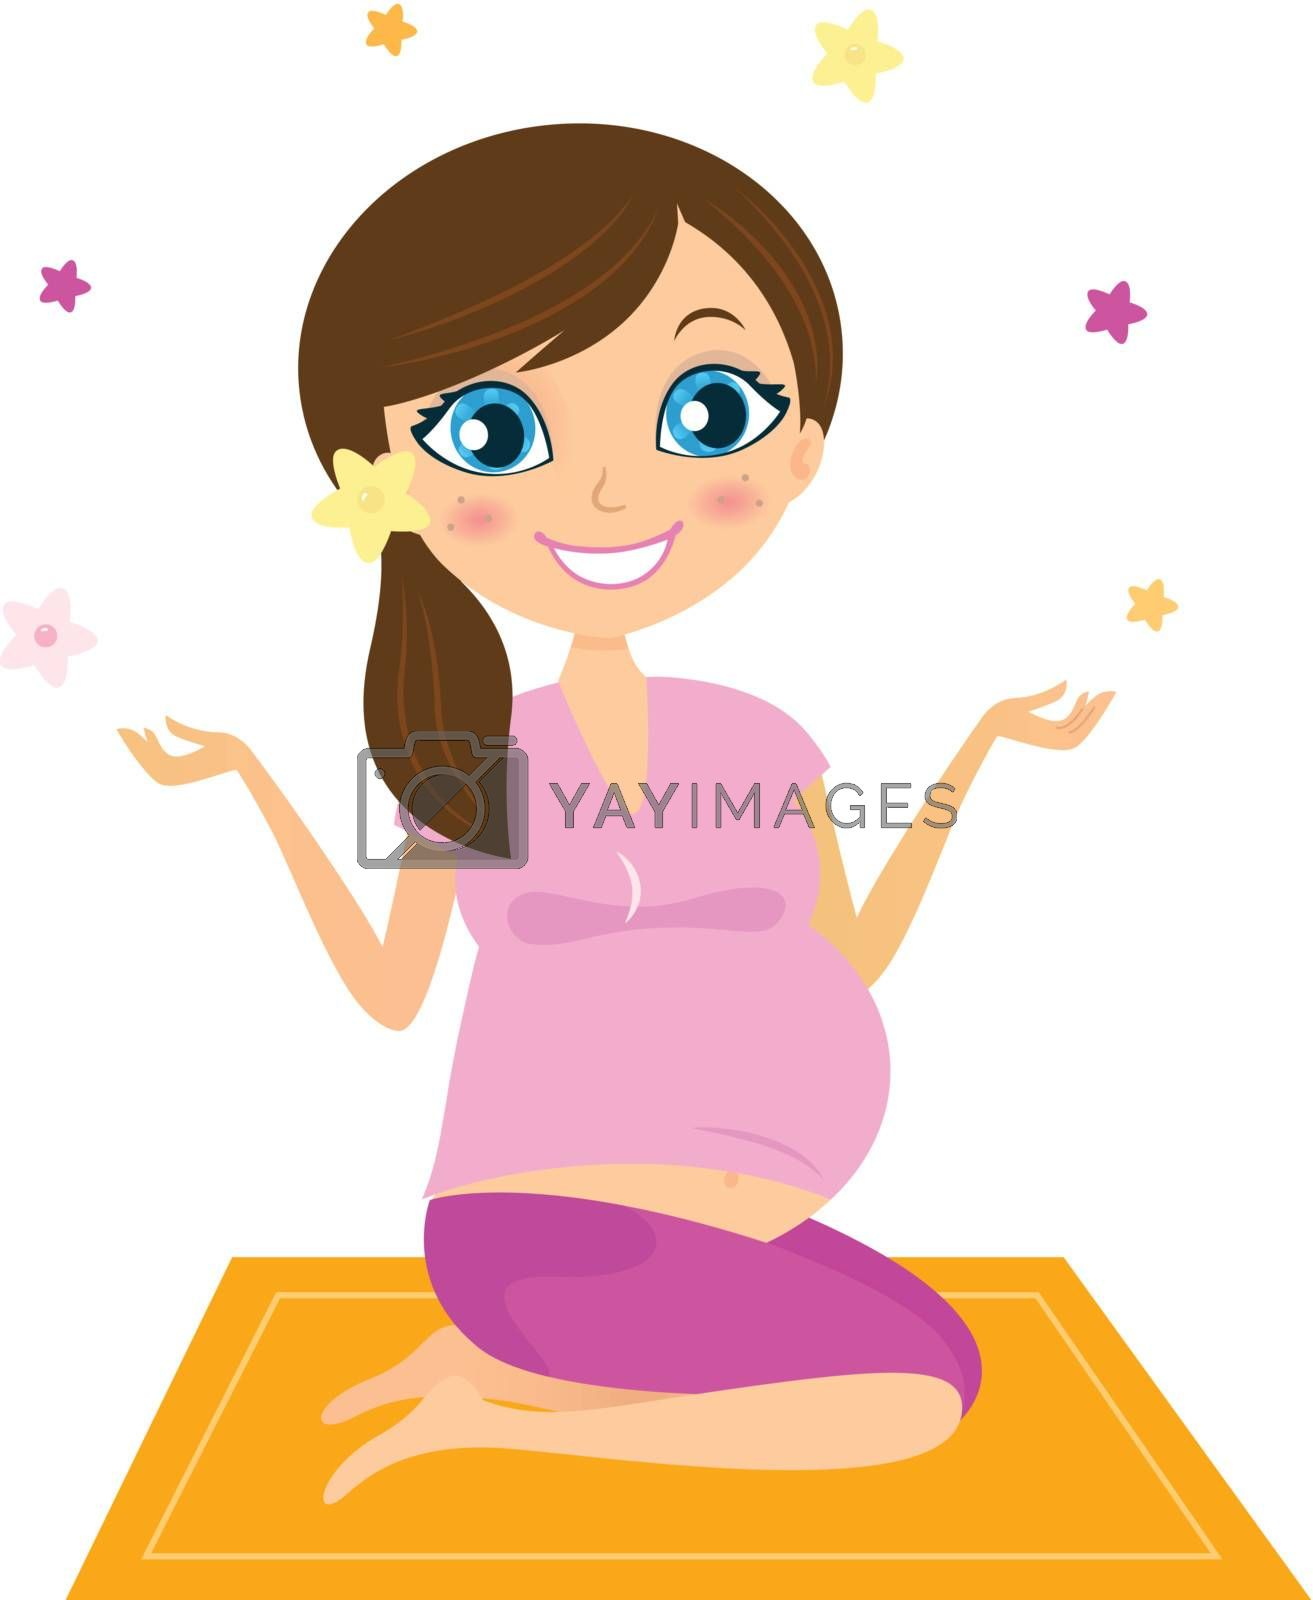 Woman sitting on mat and practicing yoga asana. Vector